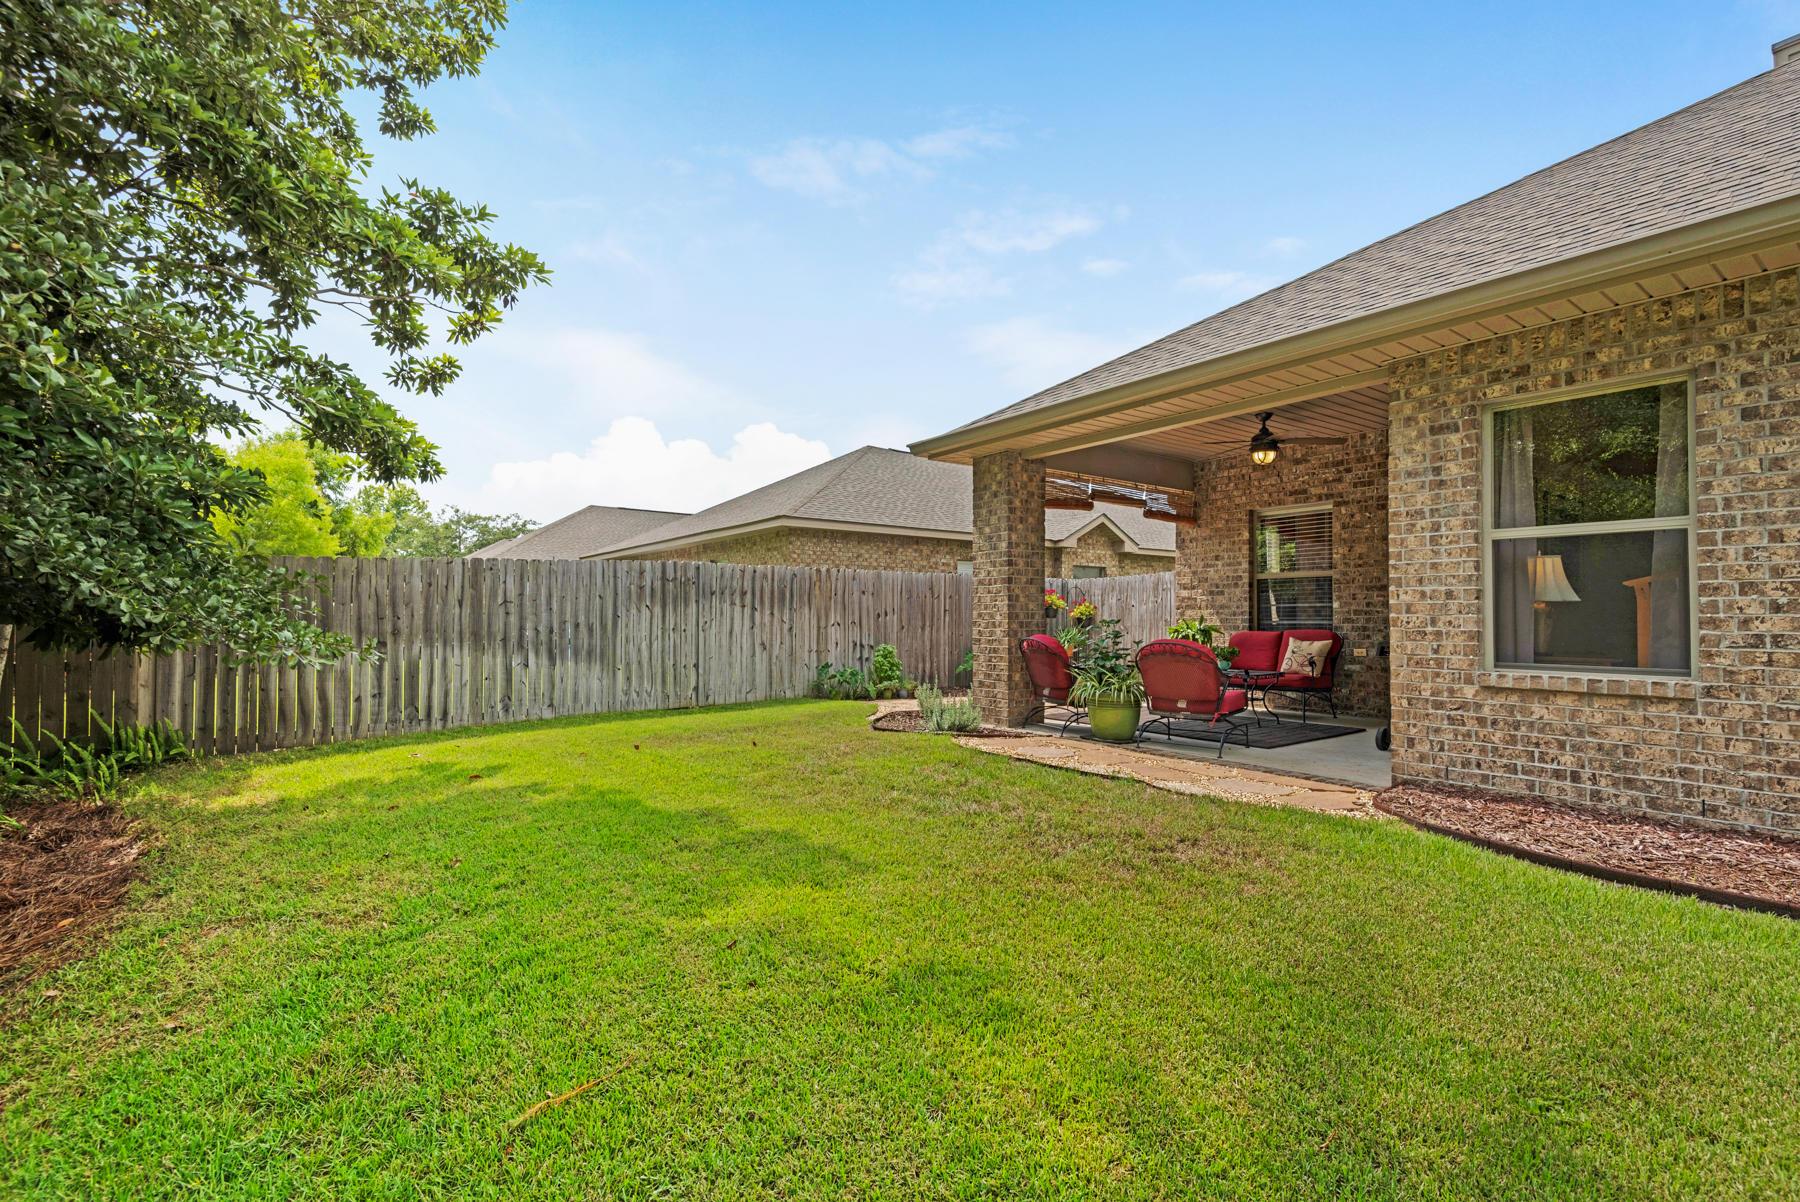 Photo of home for sale at 86 Whispering Lake, Santa Rosa Beach FL